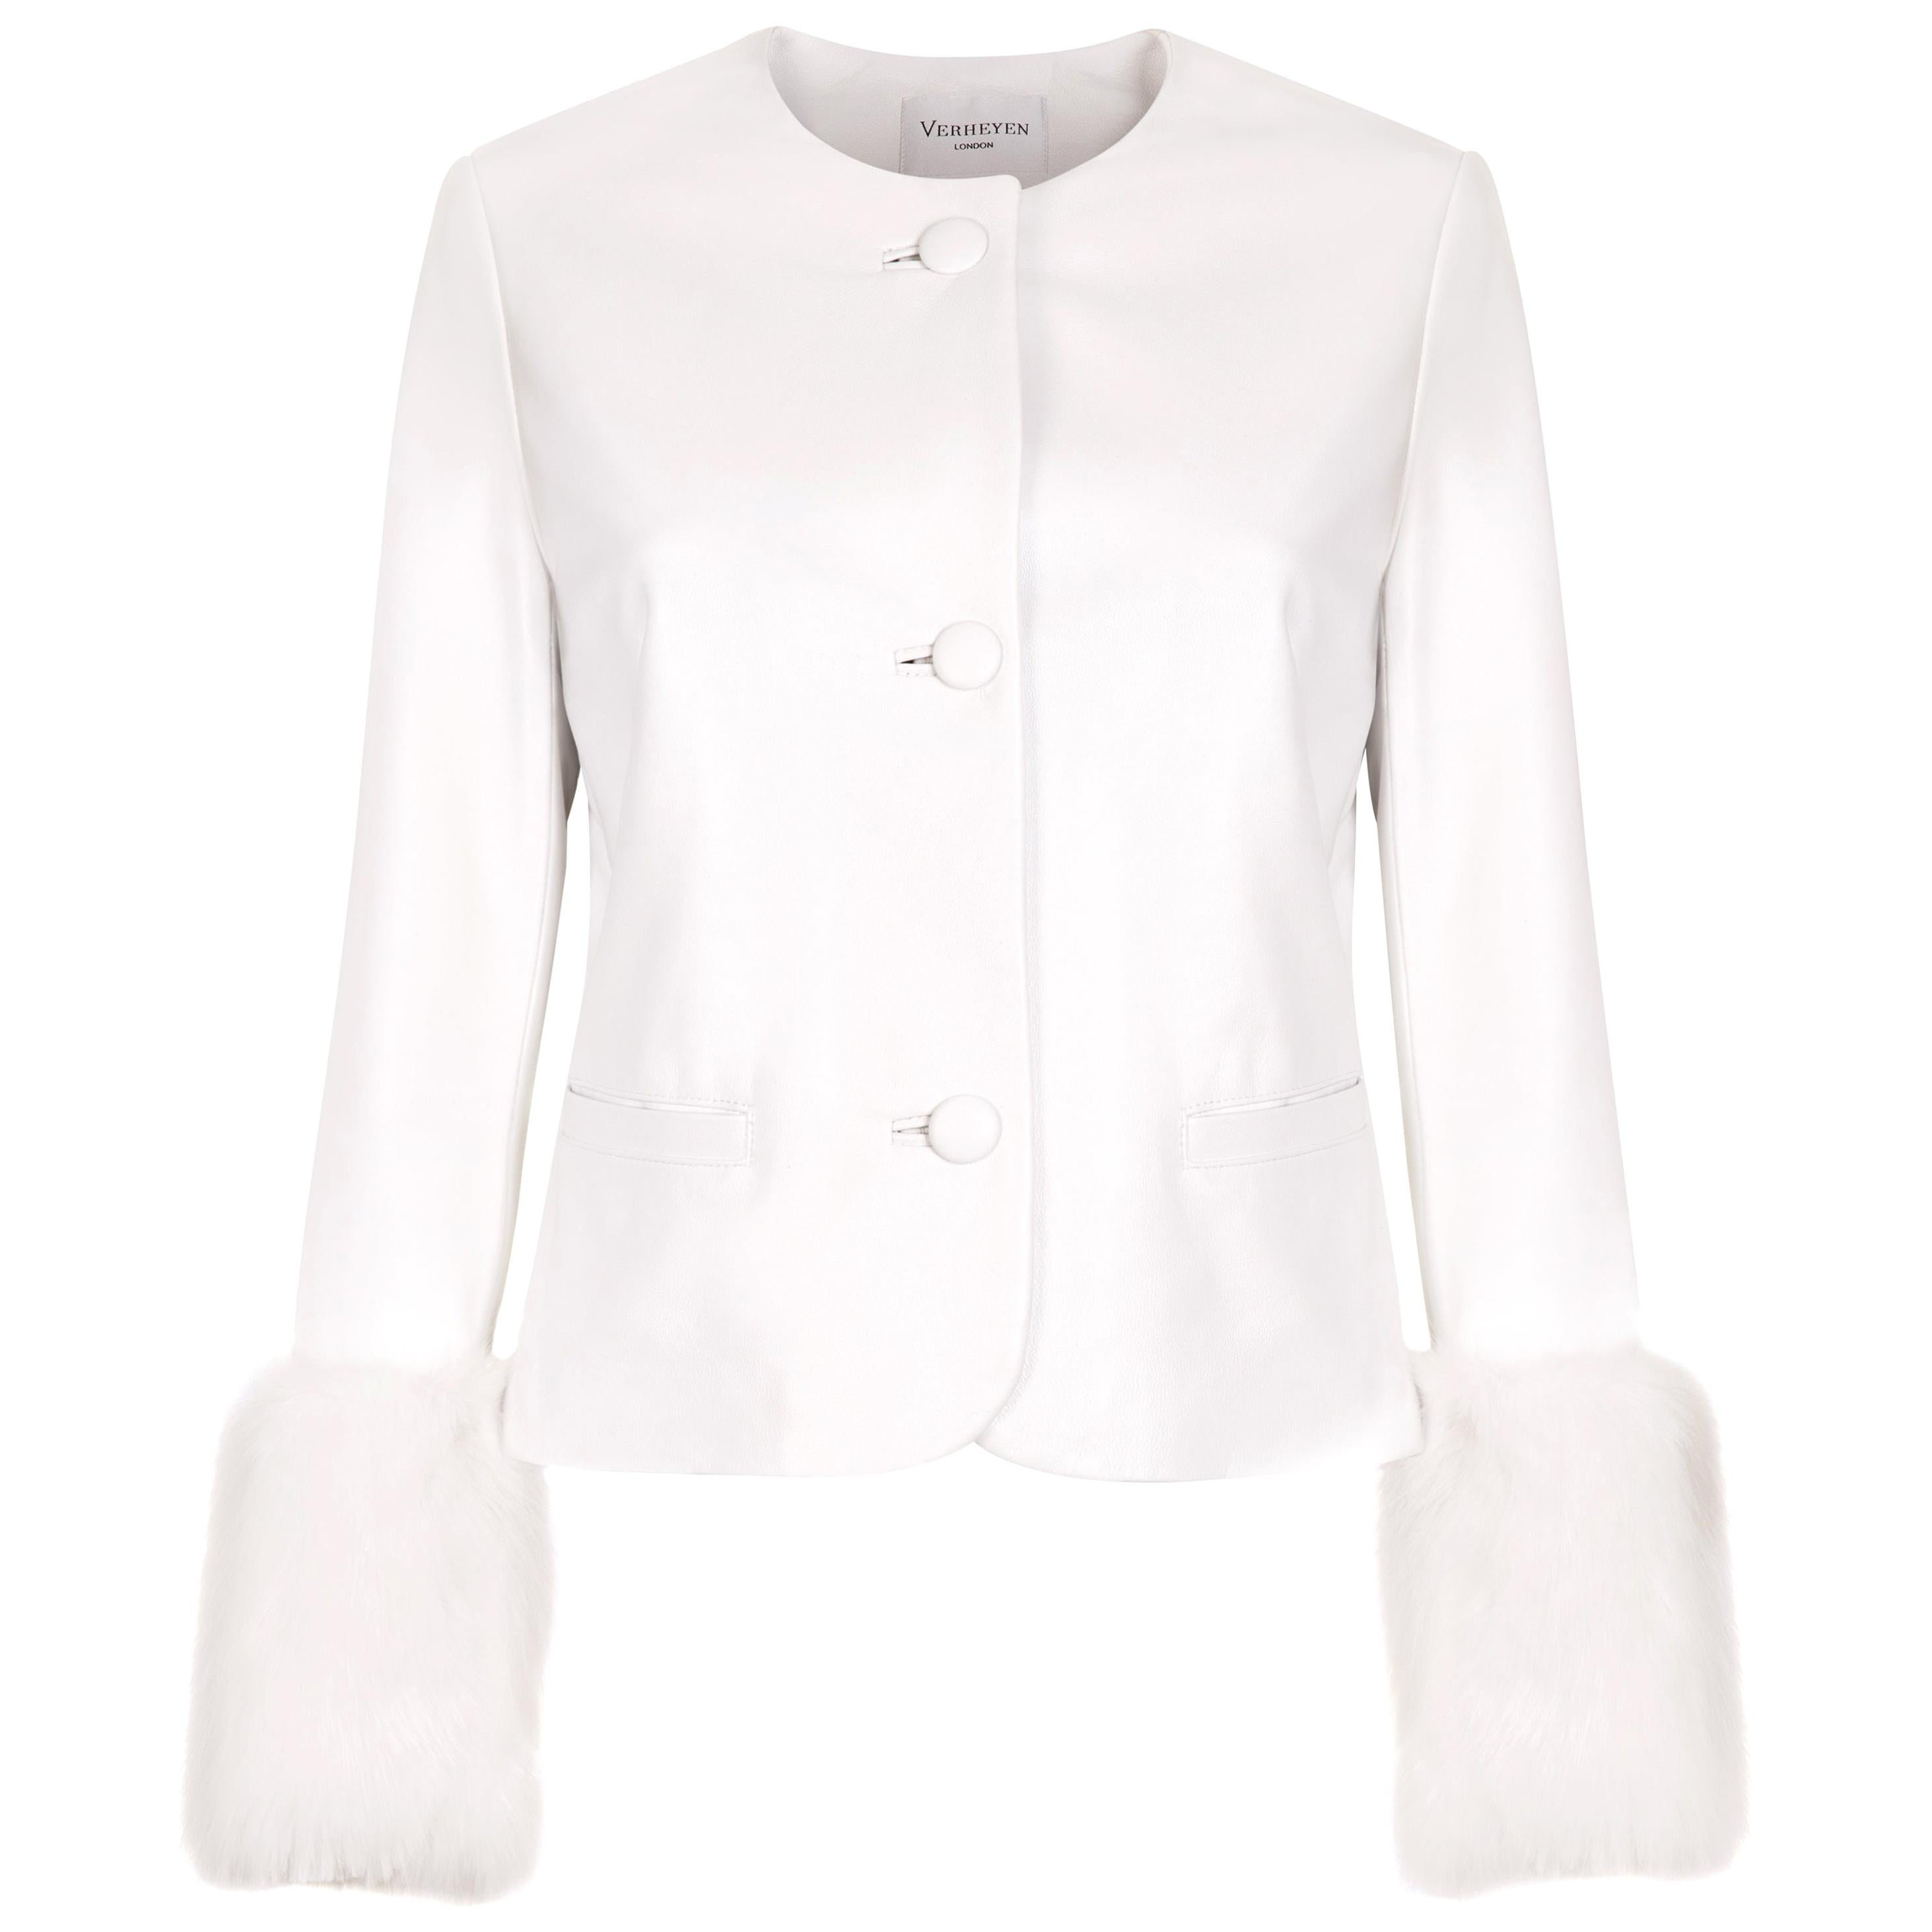 Verheyen Vita Cropped Jacket in White Leather with Faux Fur - Size uk 10